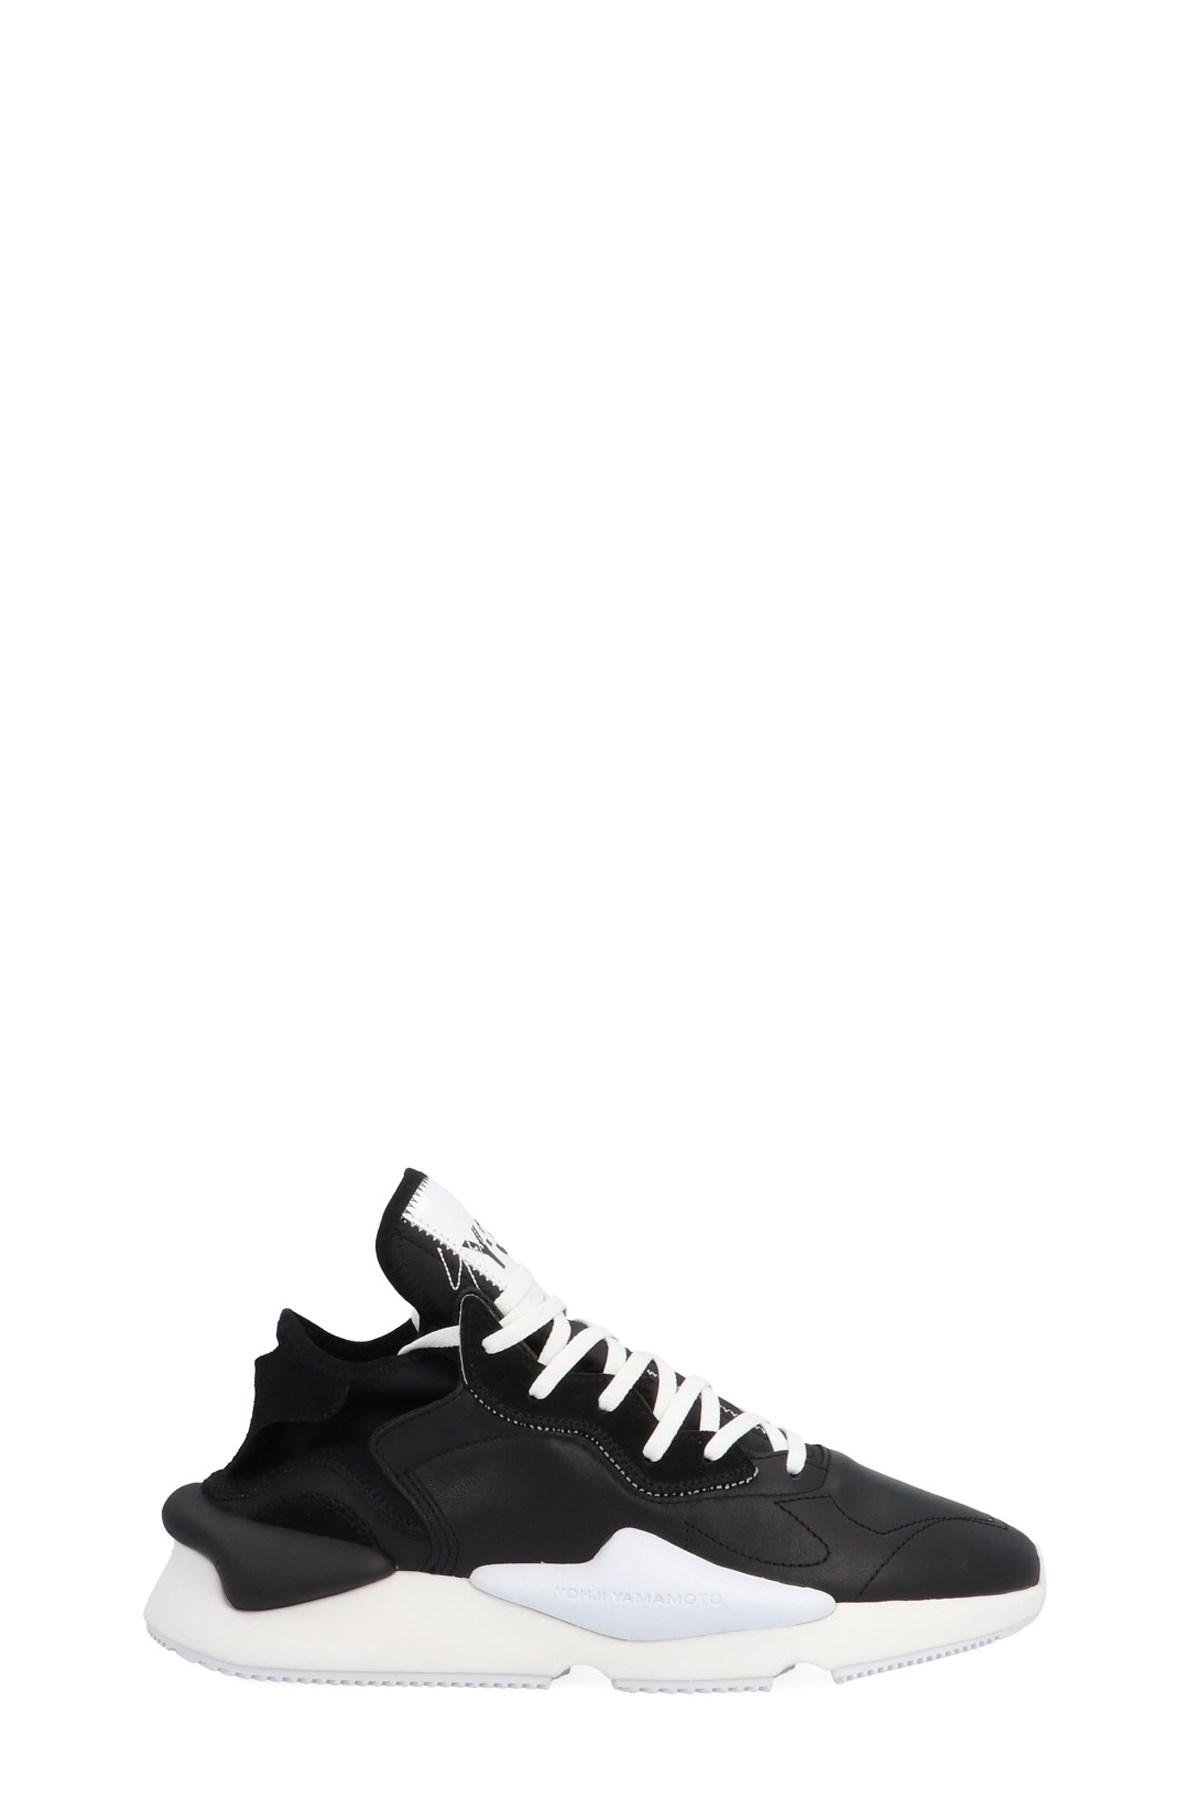 e20176b8c y-3  Kaiwa  sneakers available on julian-fashion.com - 65252